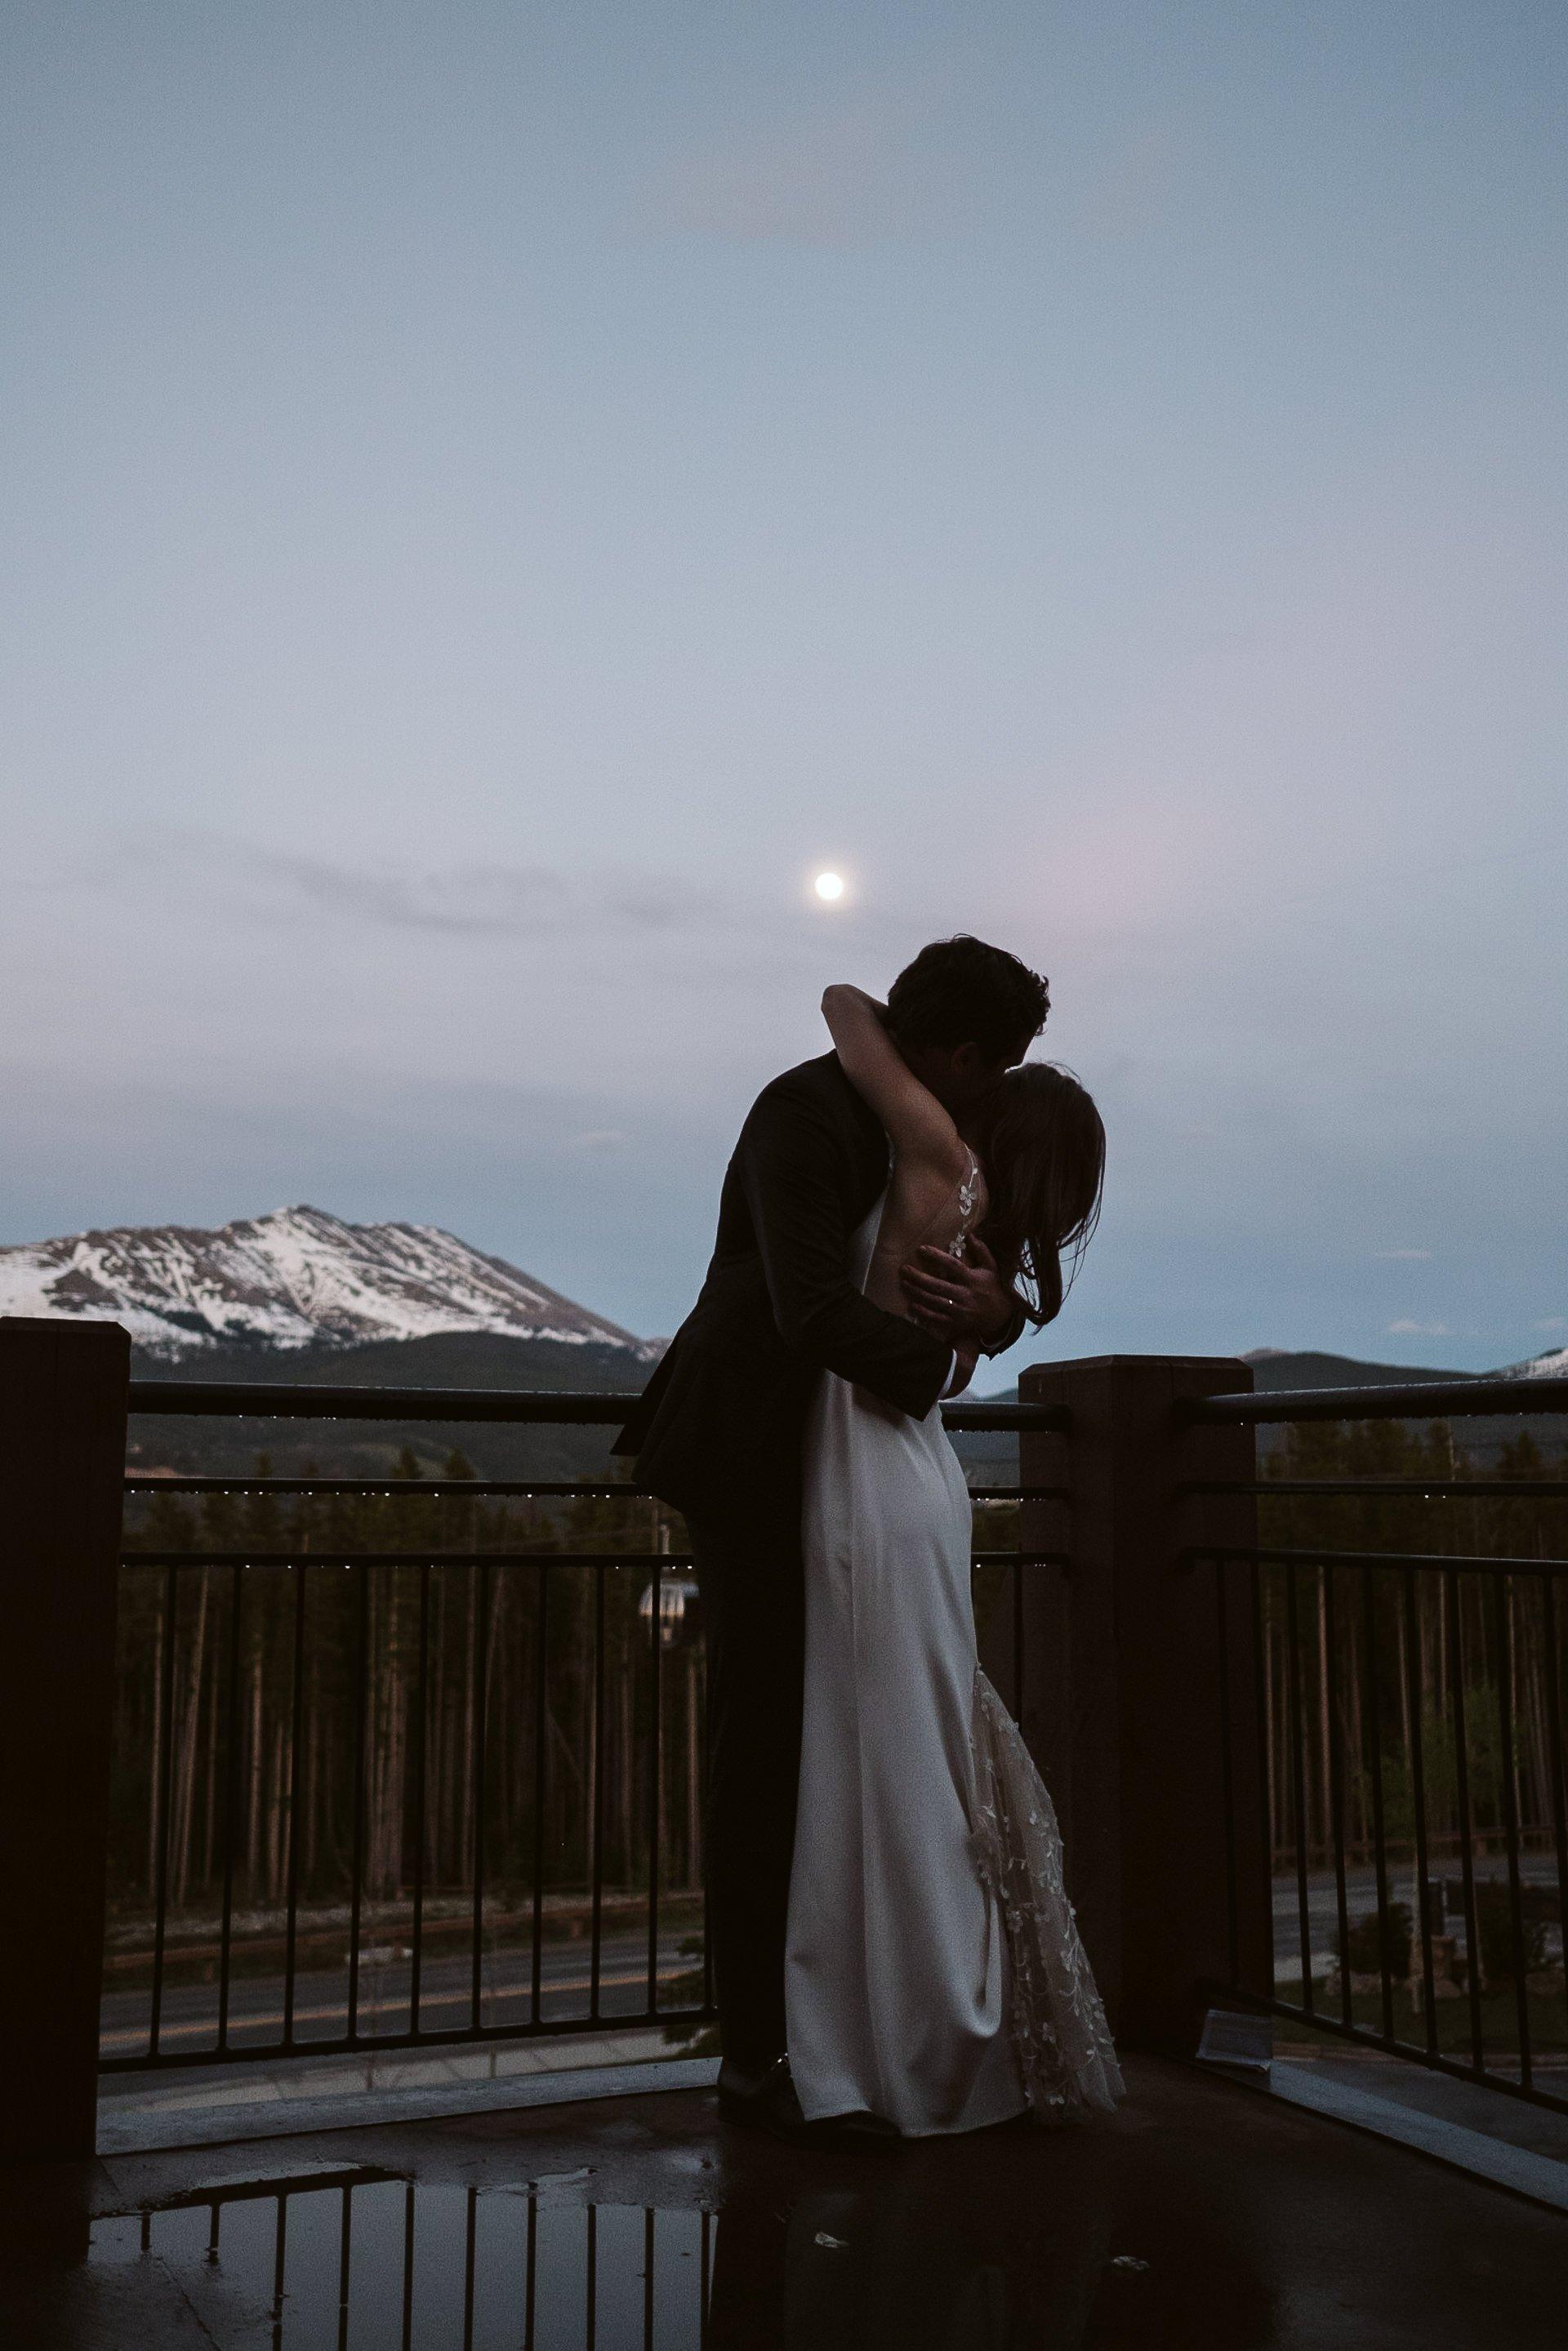 Bride and groom hugging under the moon at Breckenridge Ski Resort